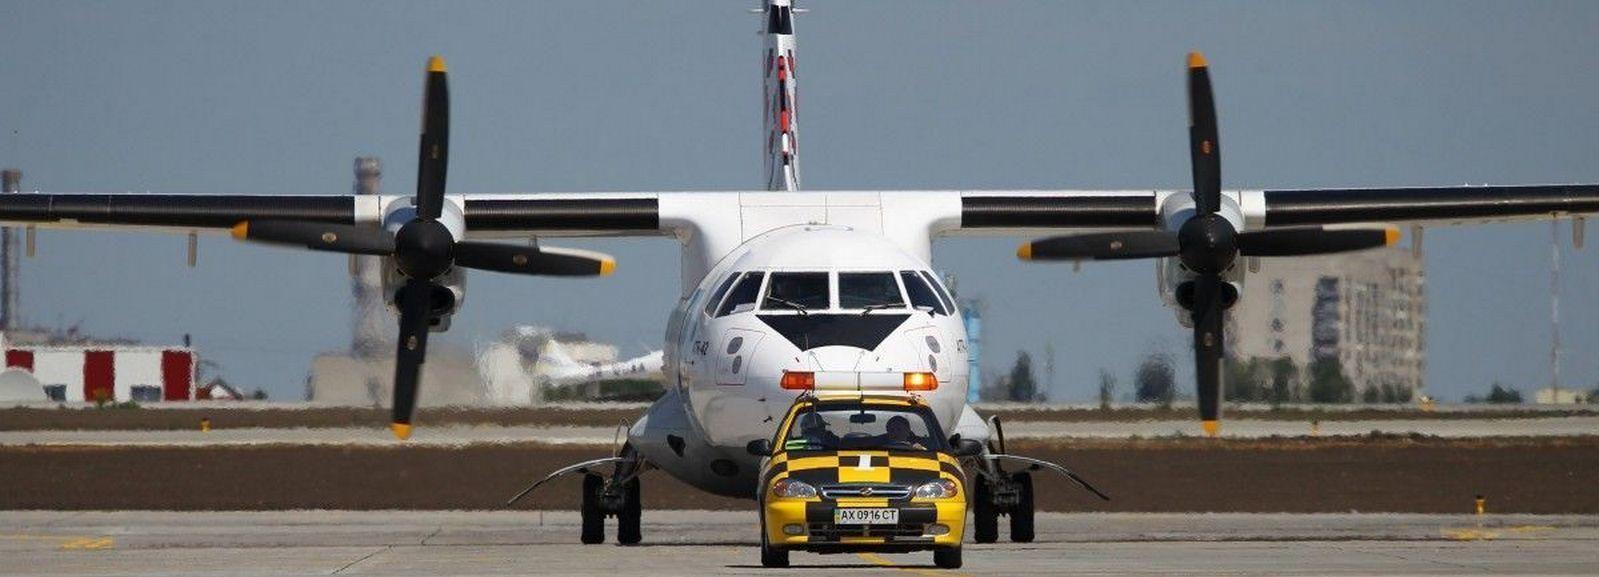 Kharkiv: Privater One-Way-Flughafentransfer